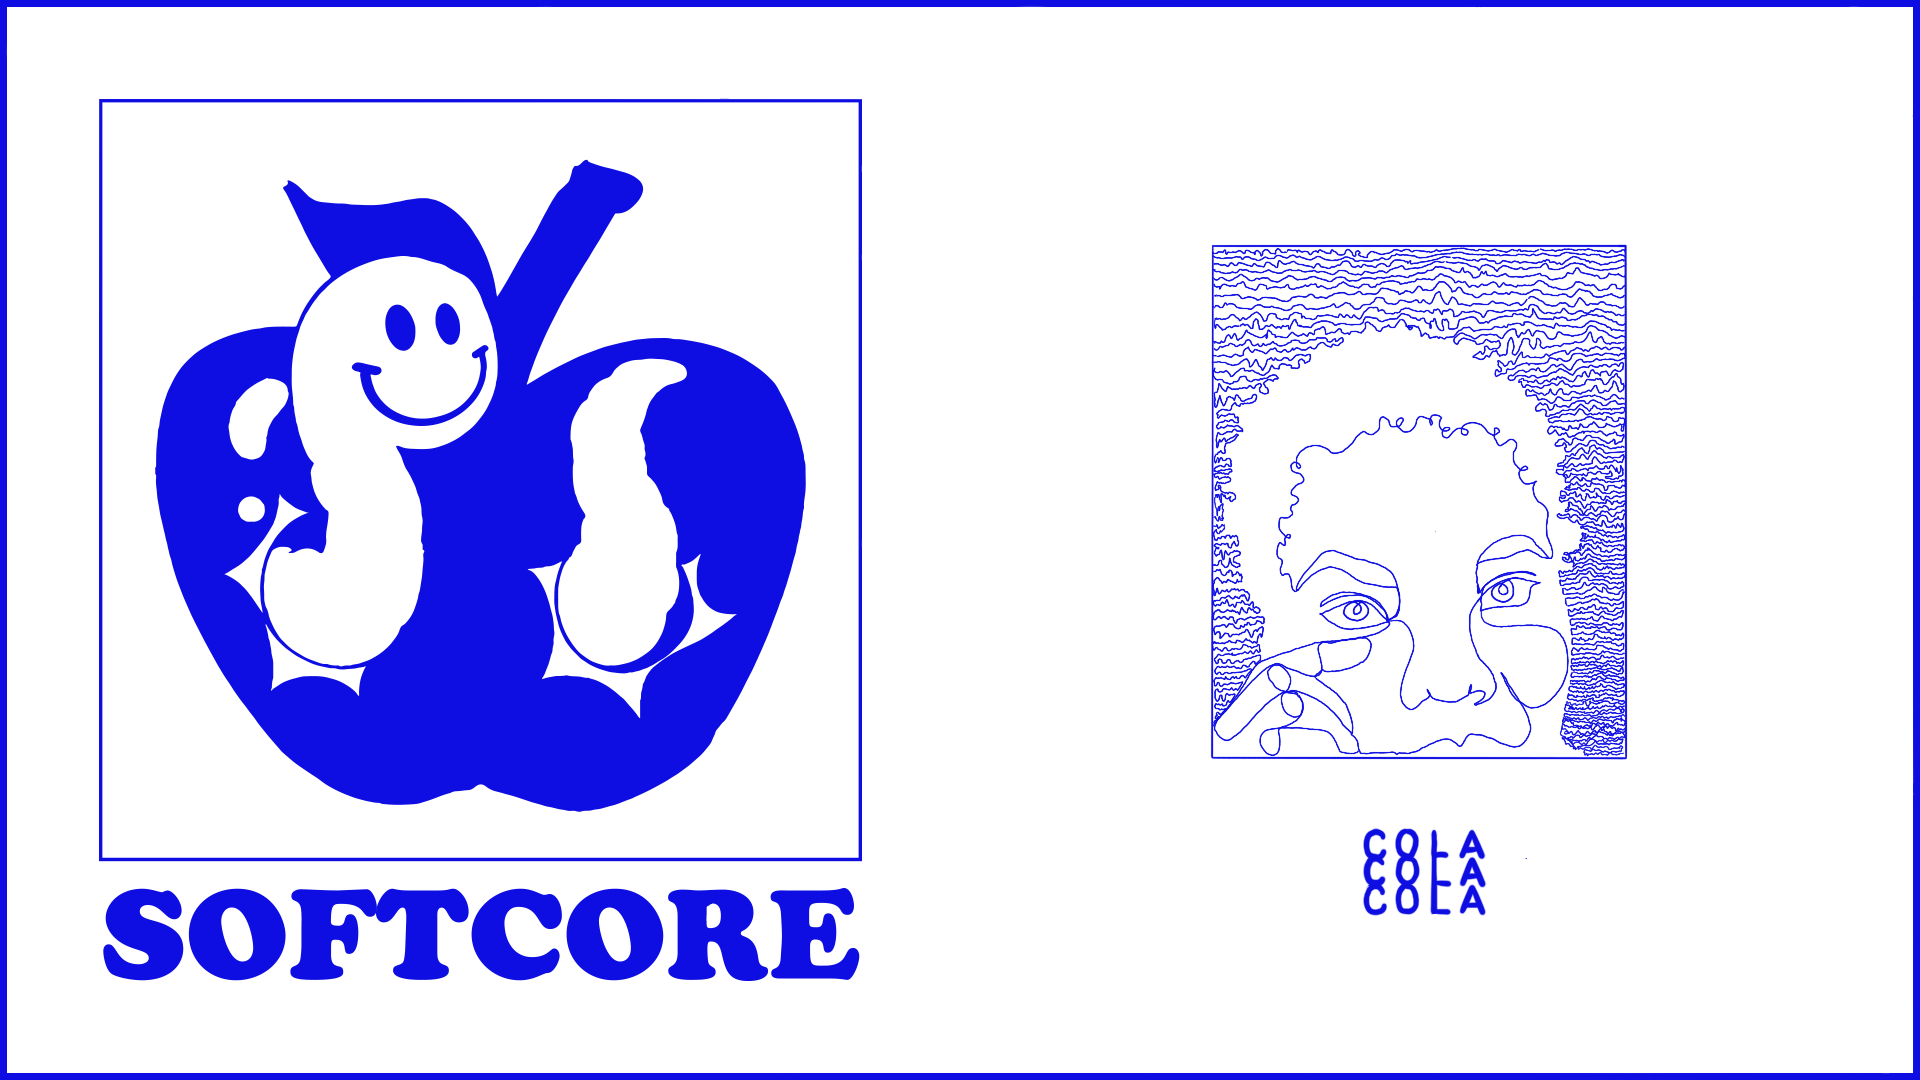 6E9663C0-E668-4691-B242-DCC9CEA9F1A5.png